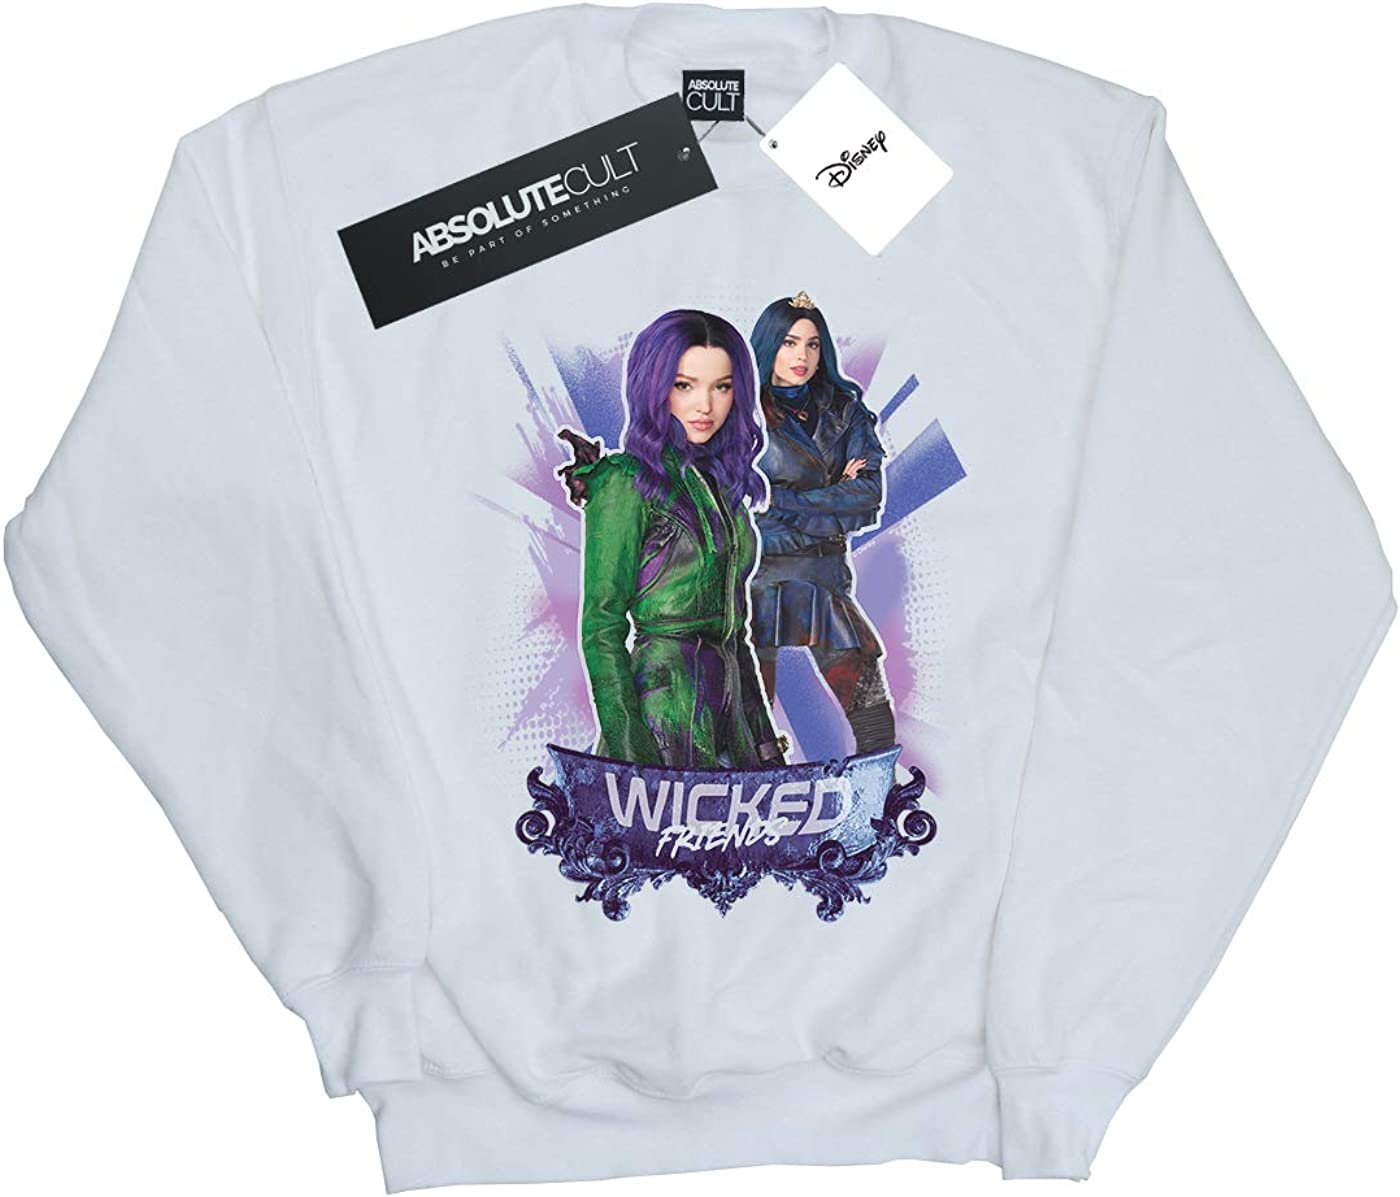 Disney Girls The Descendants Wicked Friends Sweatshirt